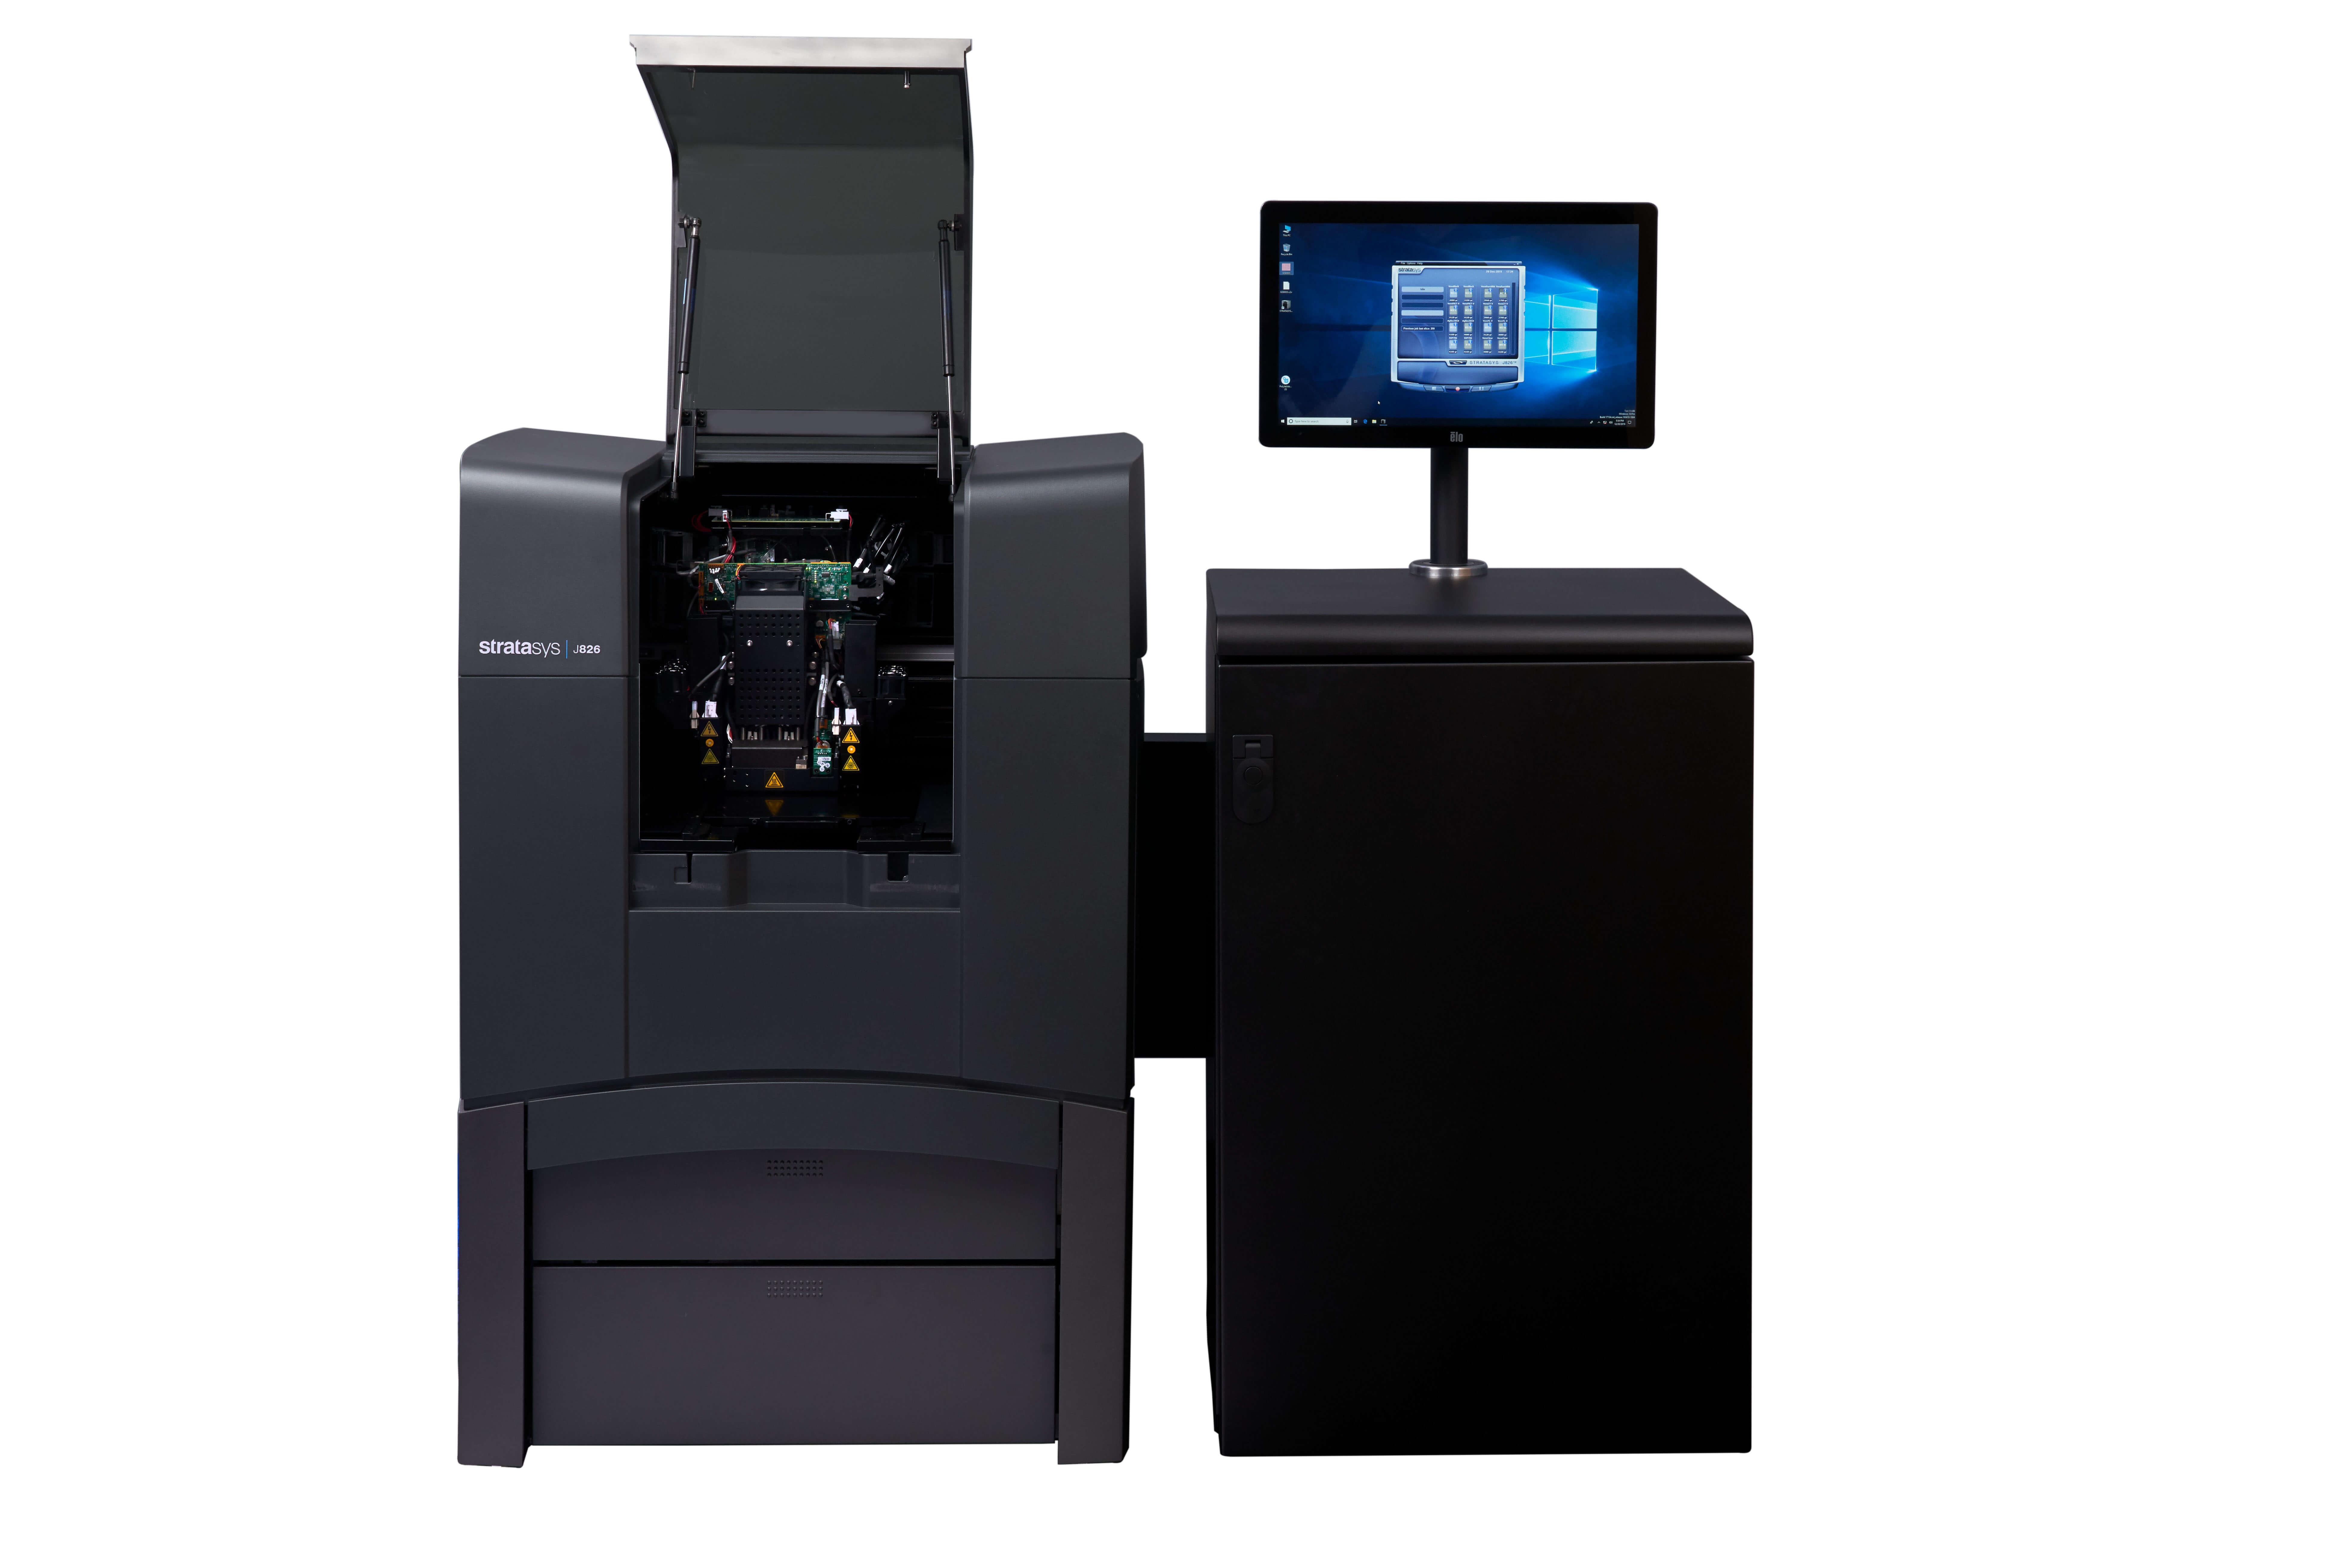 J826 Stratasys - 3D printers